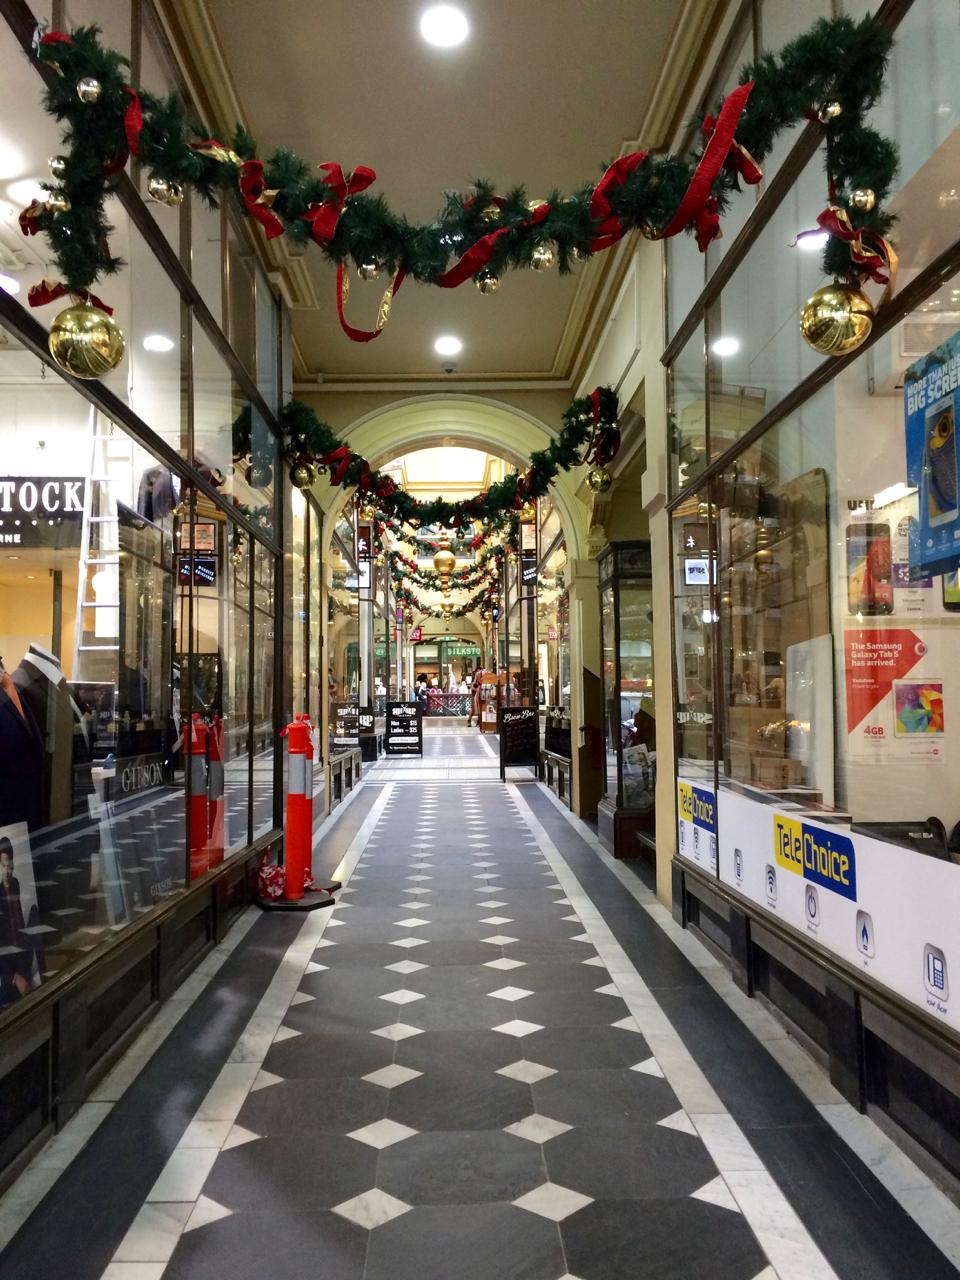 Melbourne, Australia arcade